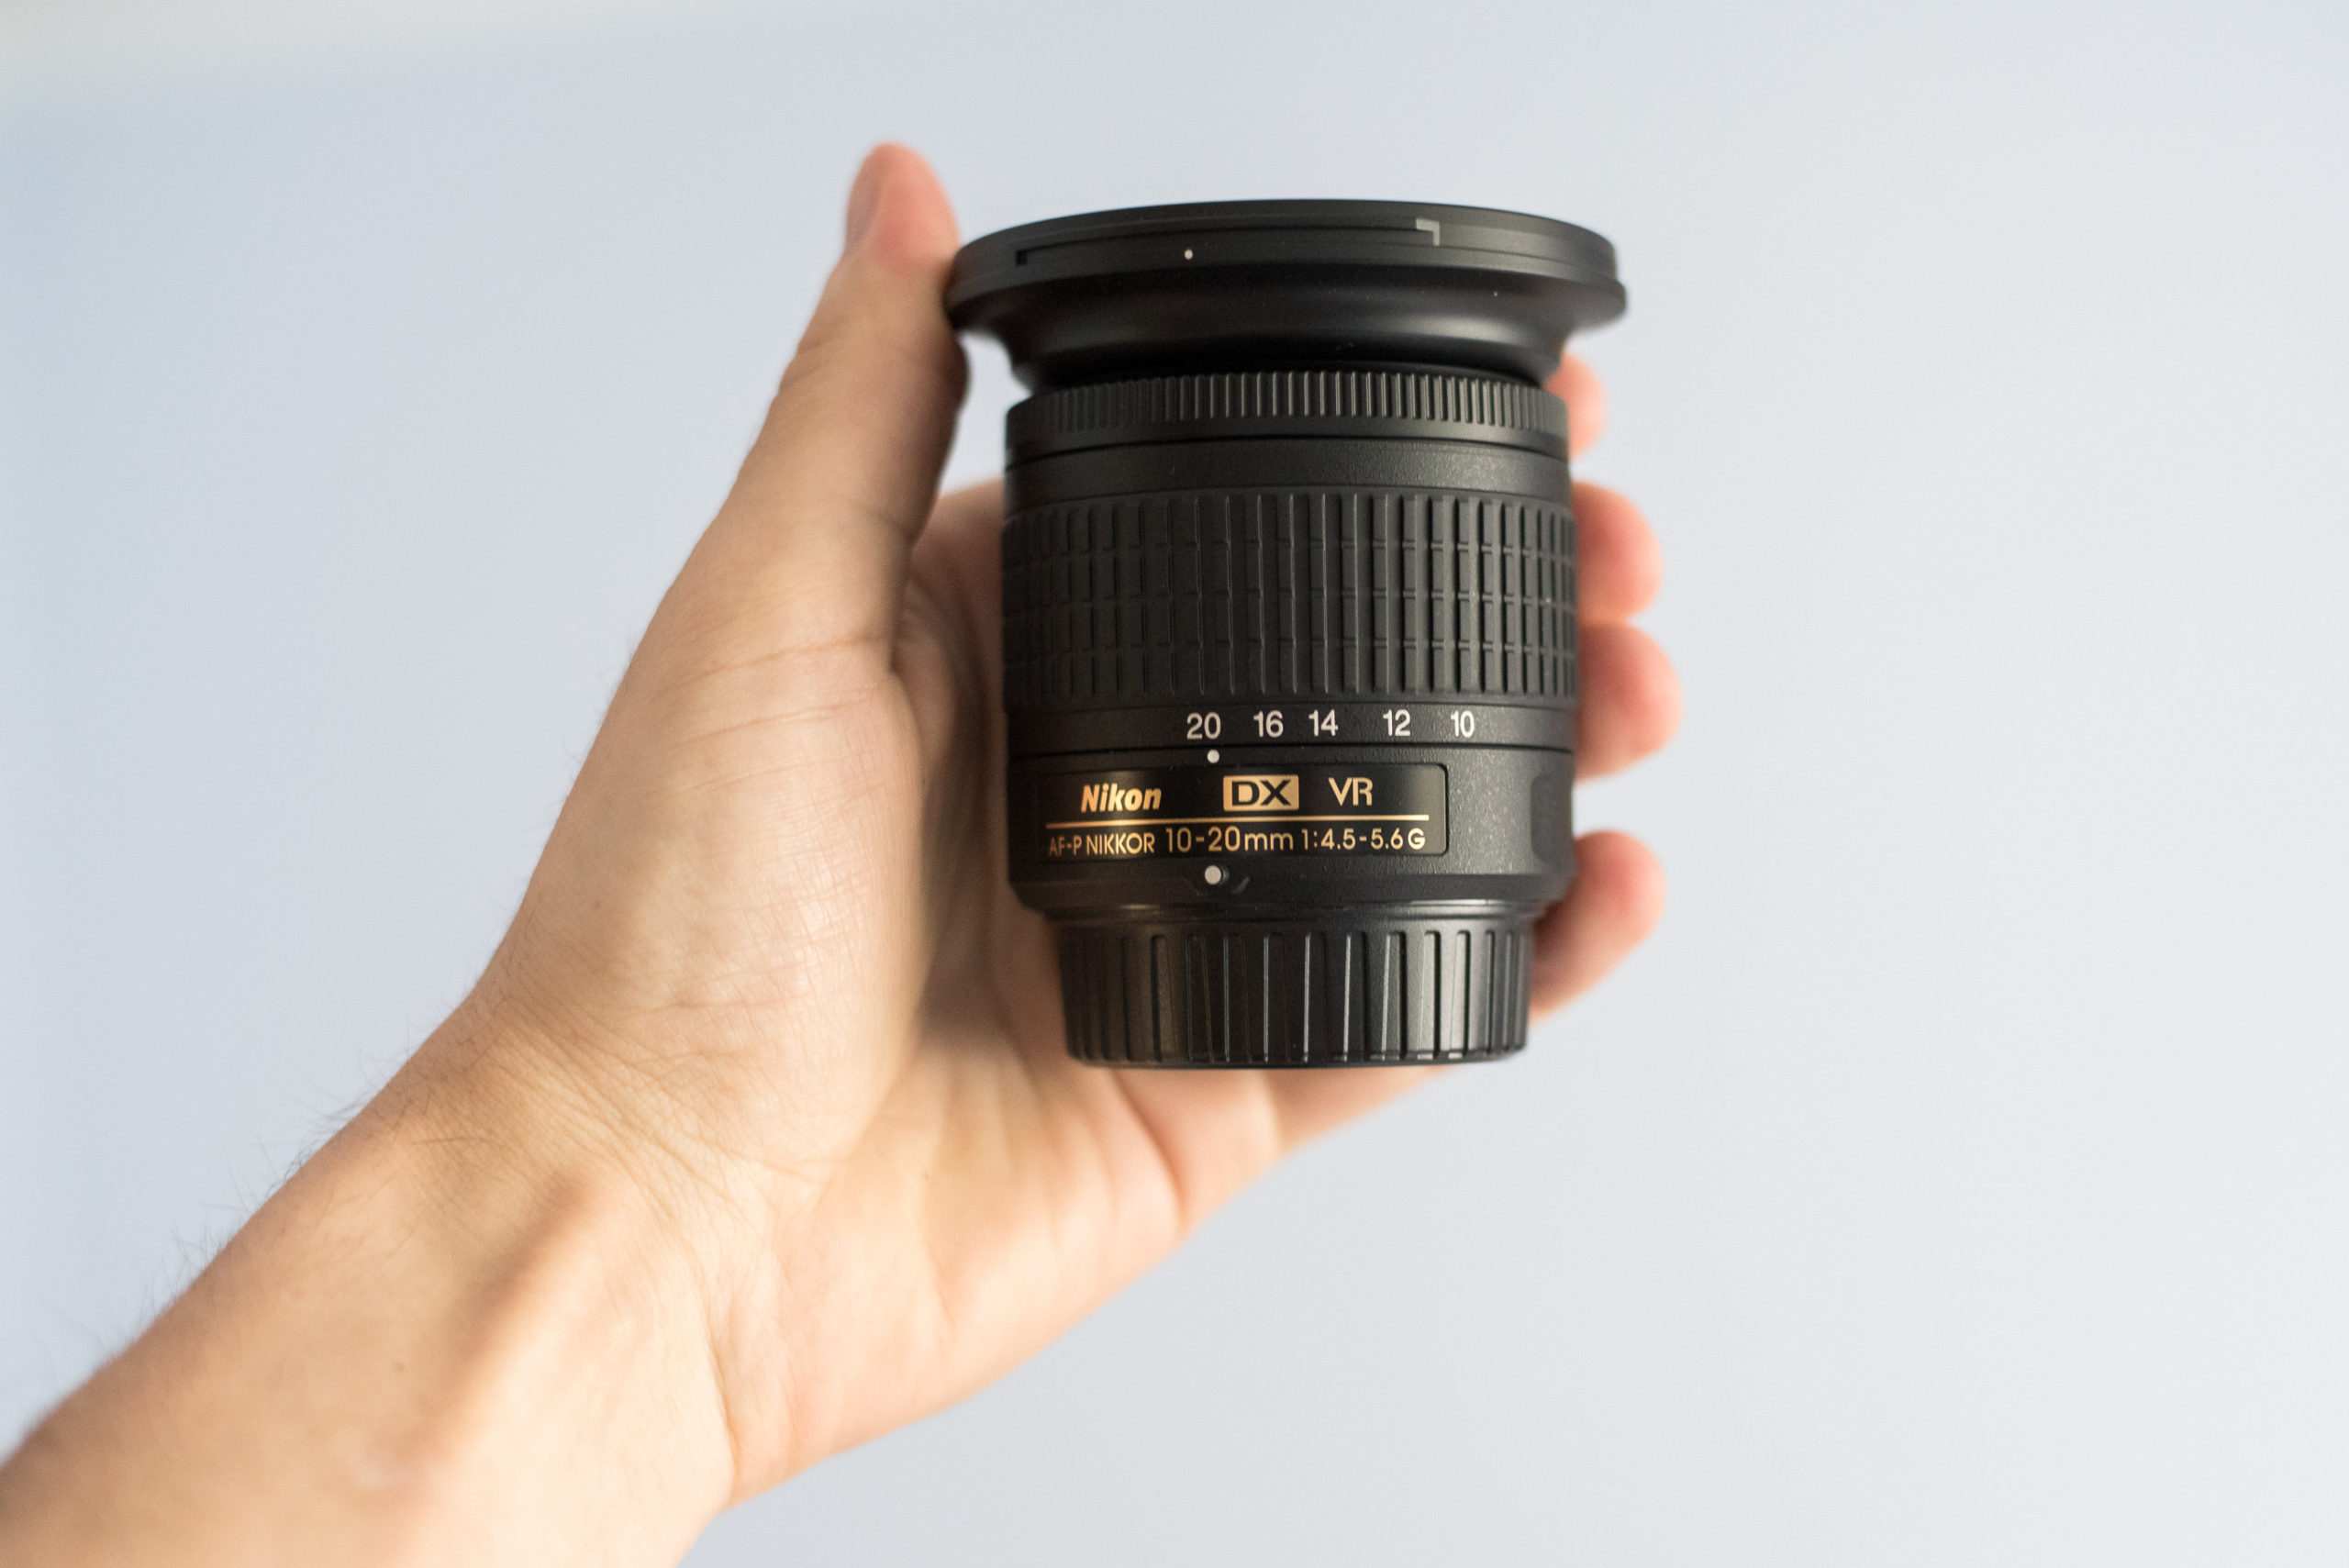 Recenze nejmenšího širokoúhlého objektivu Nikon 10-20mm AF-P VR: malý, ale šikovný